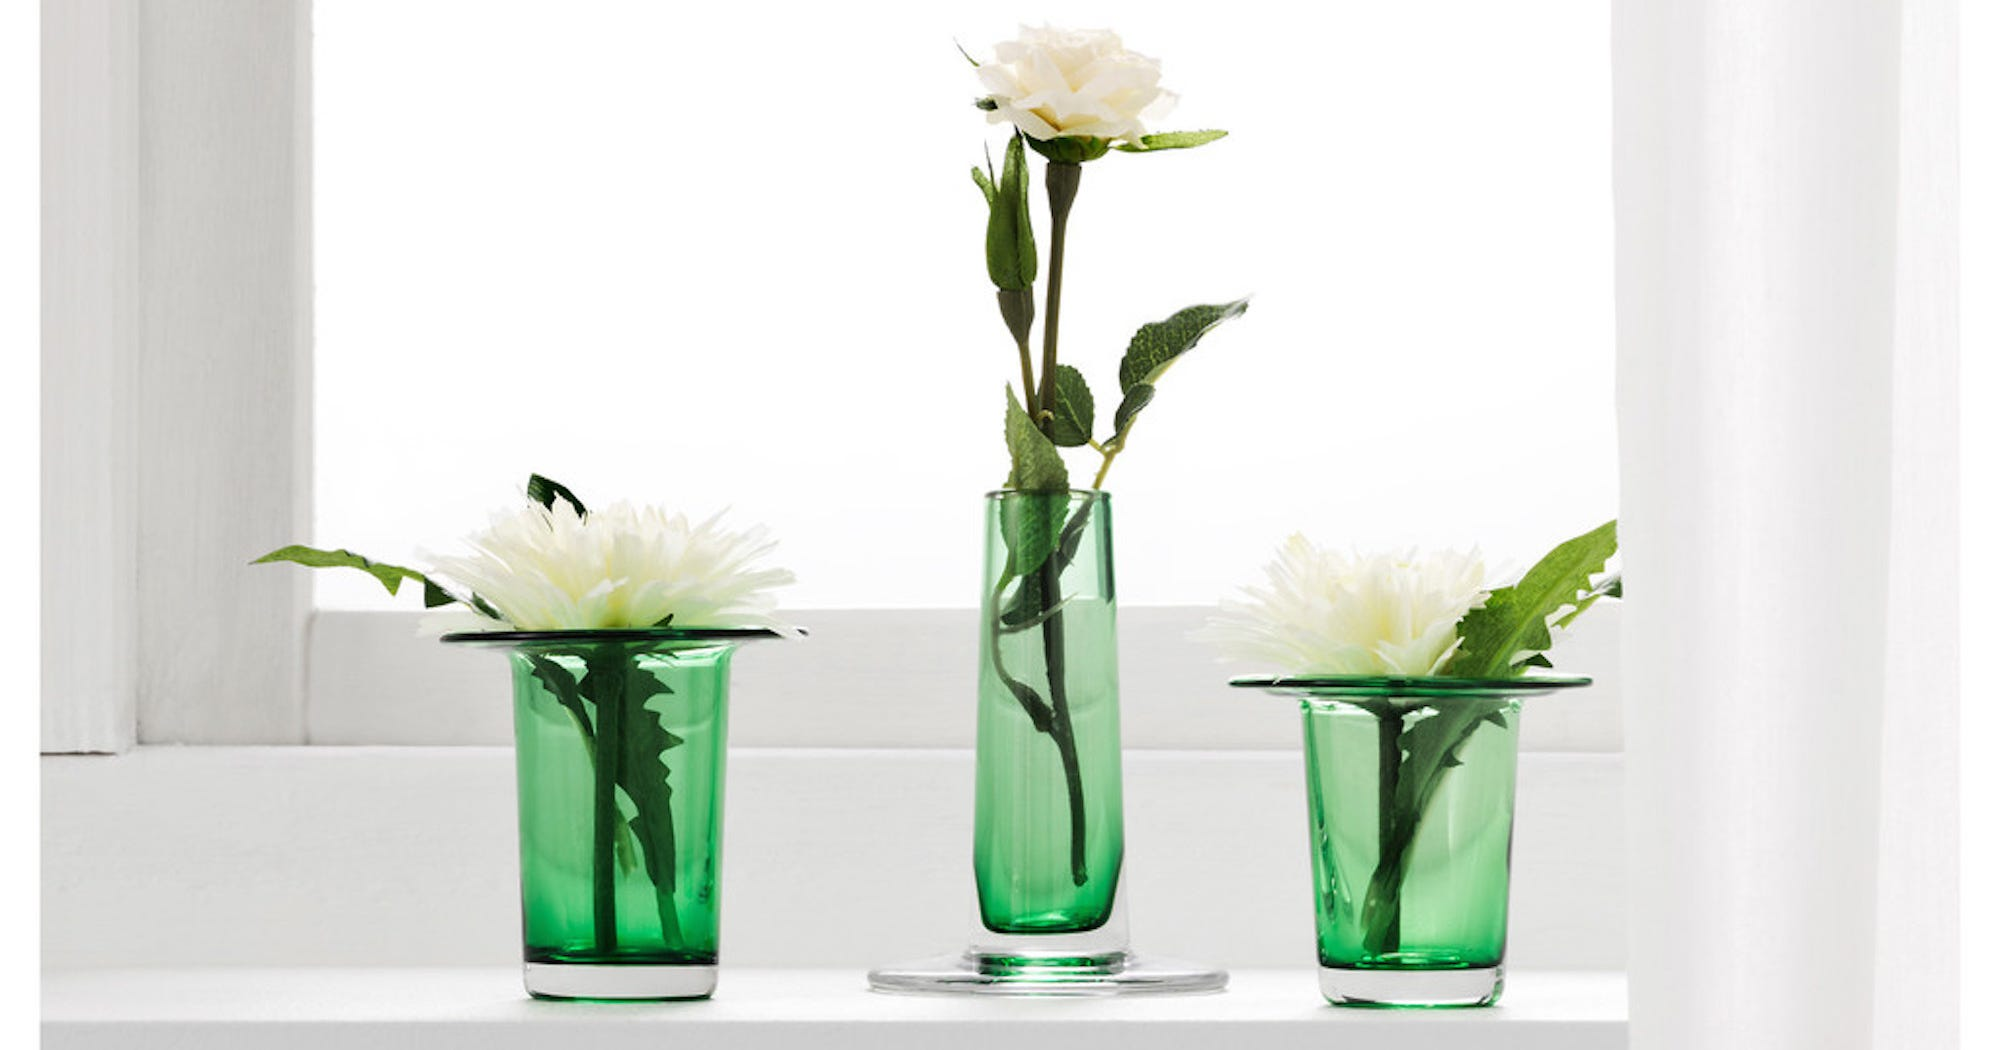 Vase transparent ikea nah with vase transparent ikea ikea clear vase transparent ikea with vase transparent ikea reviewsmspy